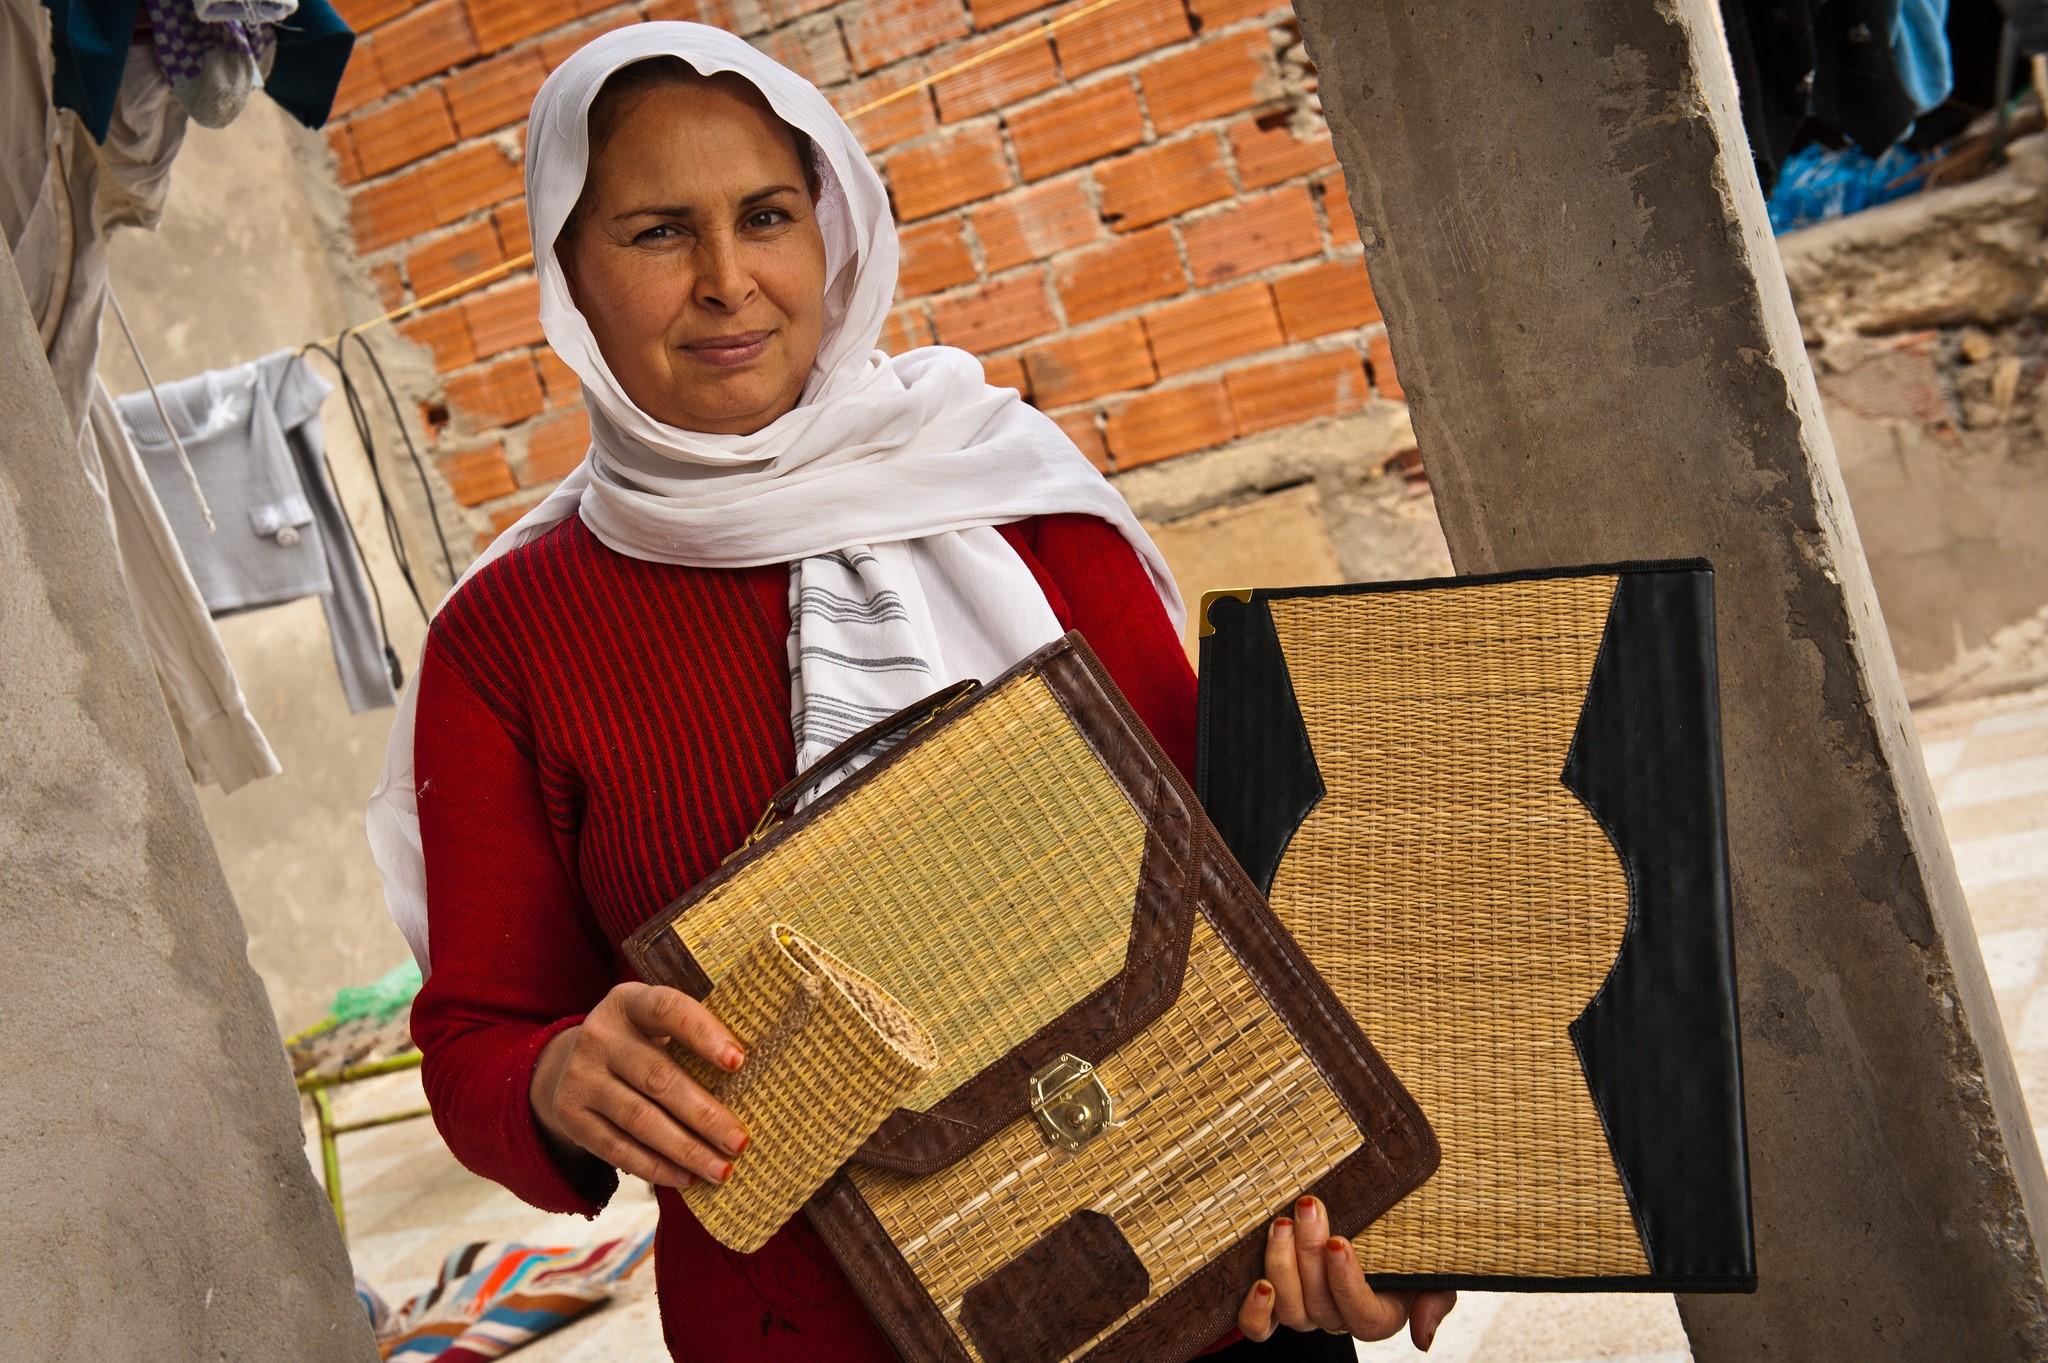 World Bank/UNDP SDGs and Her Program 2018 for Women Entrepreneurs (Win a trip to New York)